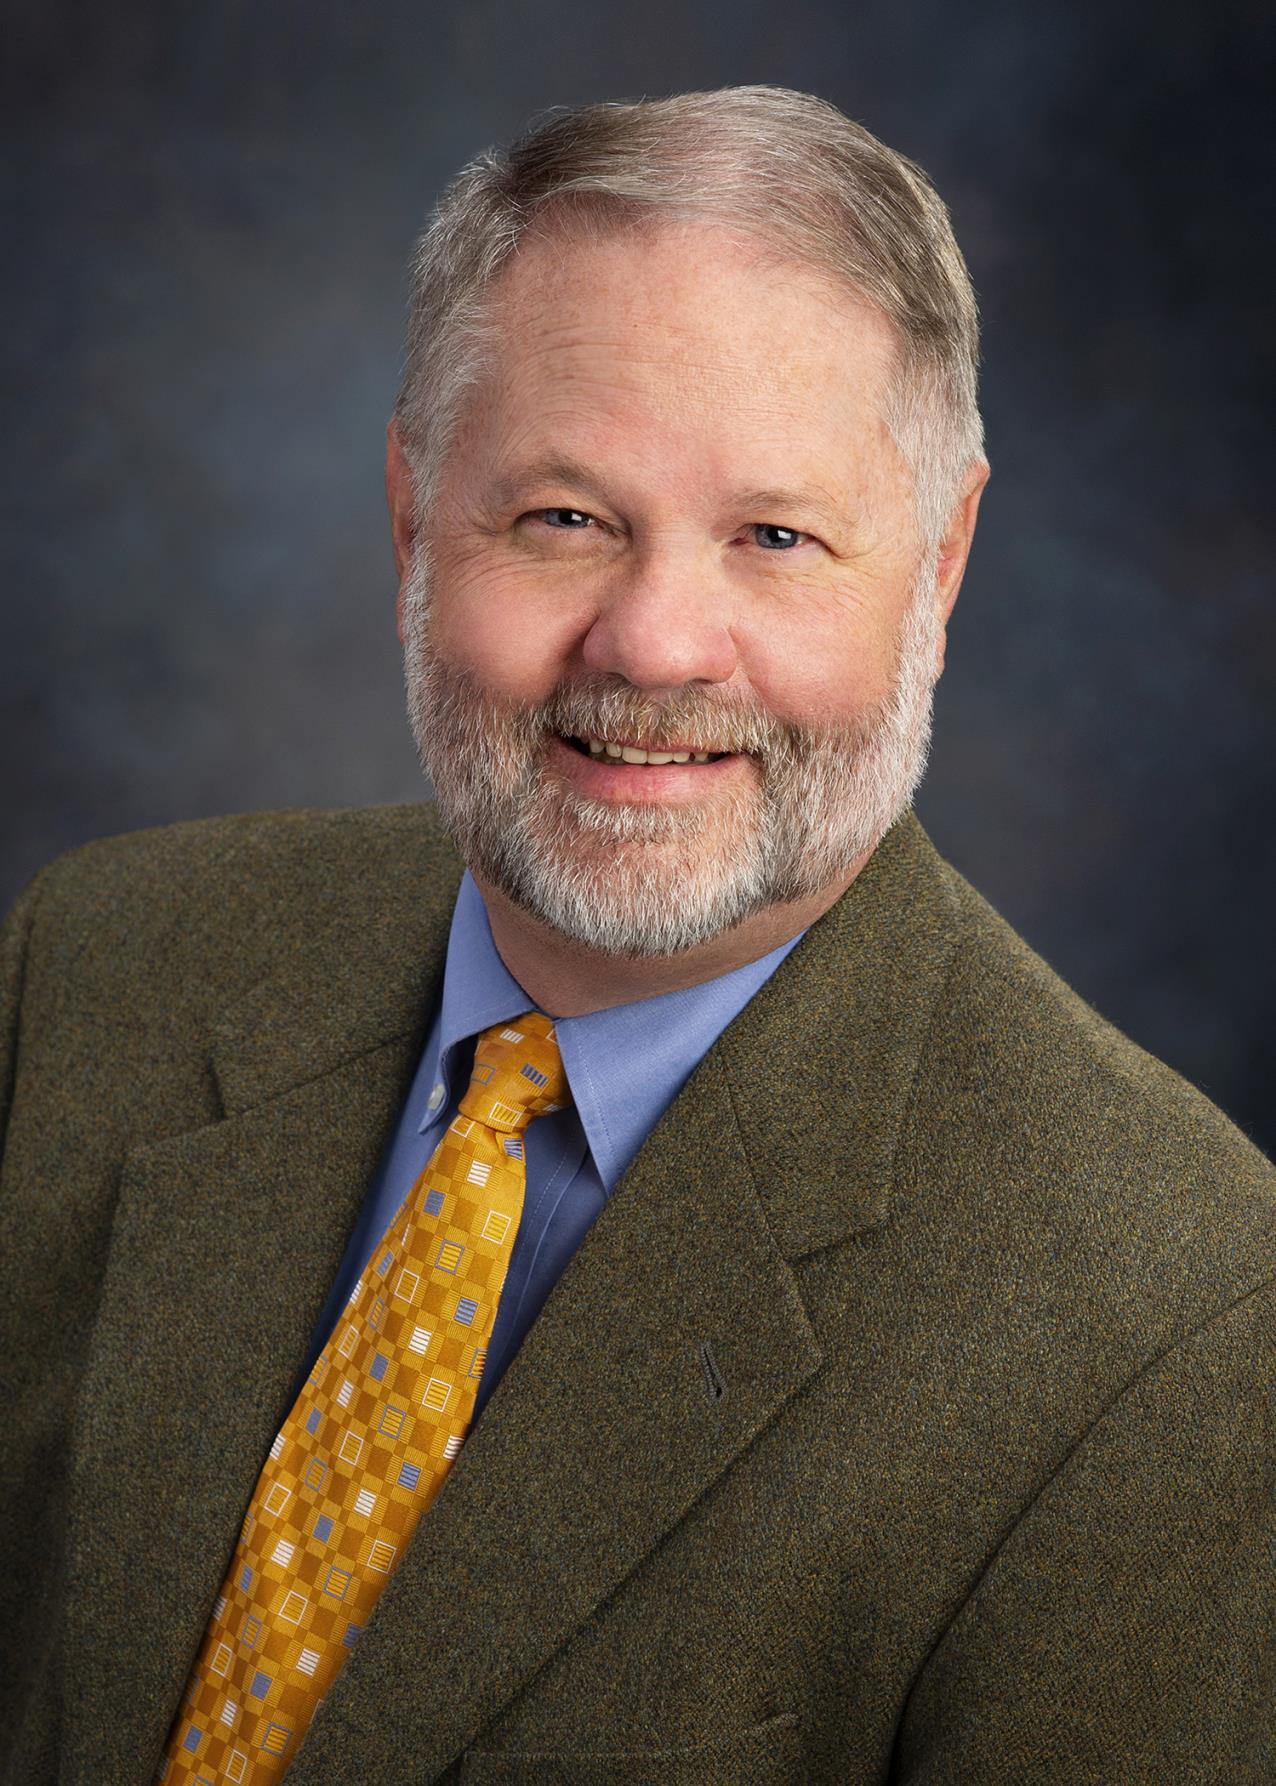 Dennis Bailey-Fougnier